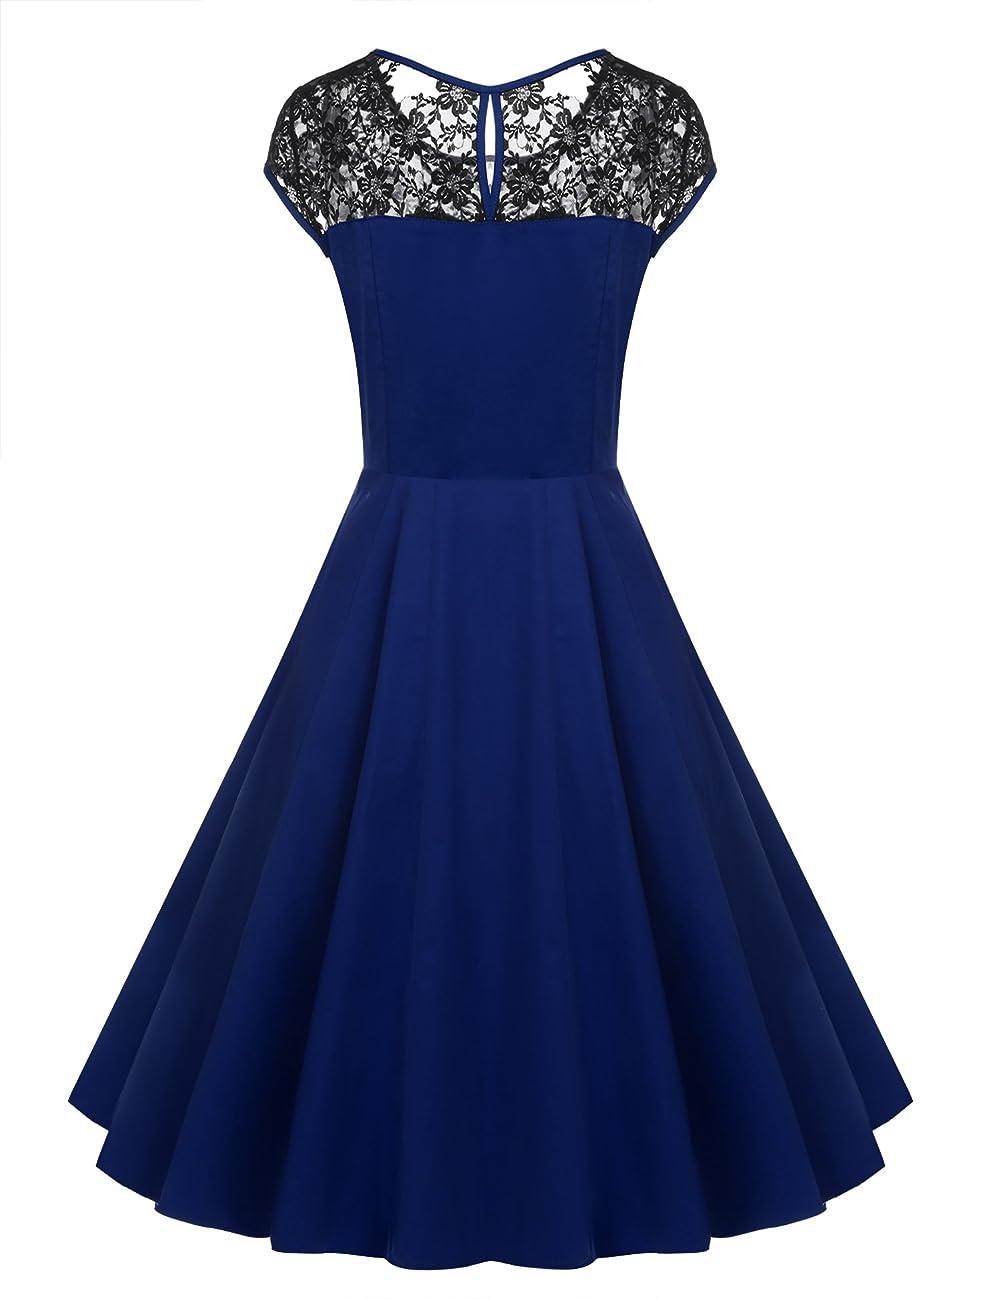 ACEVOG Women's Lace Crochet Sleeveless Cotton Vintage Tea Dress 3